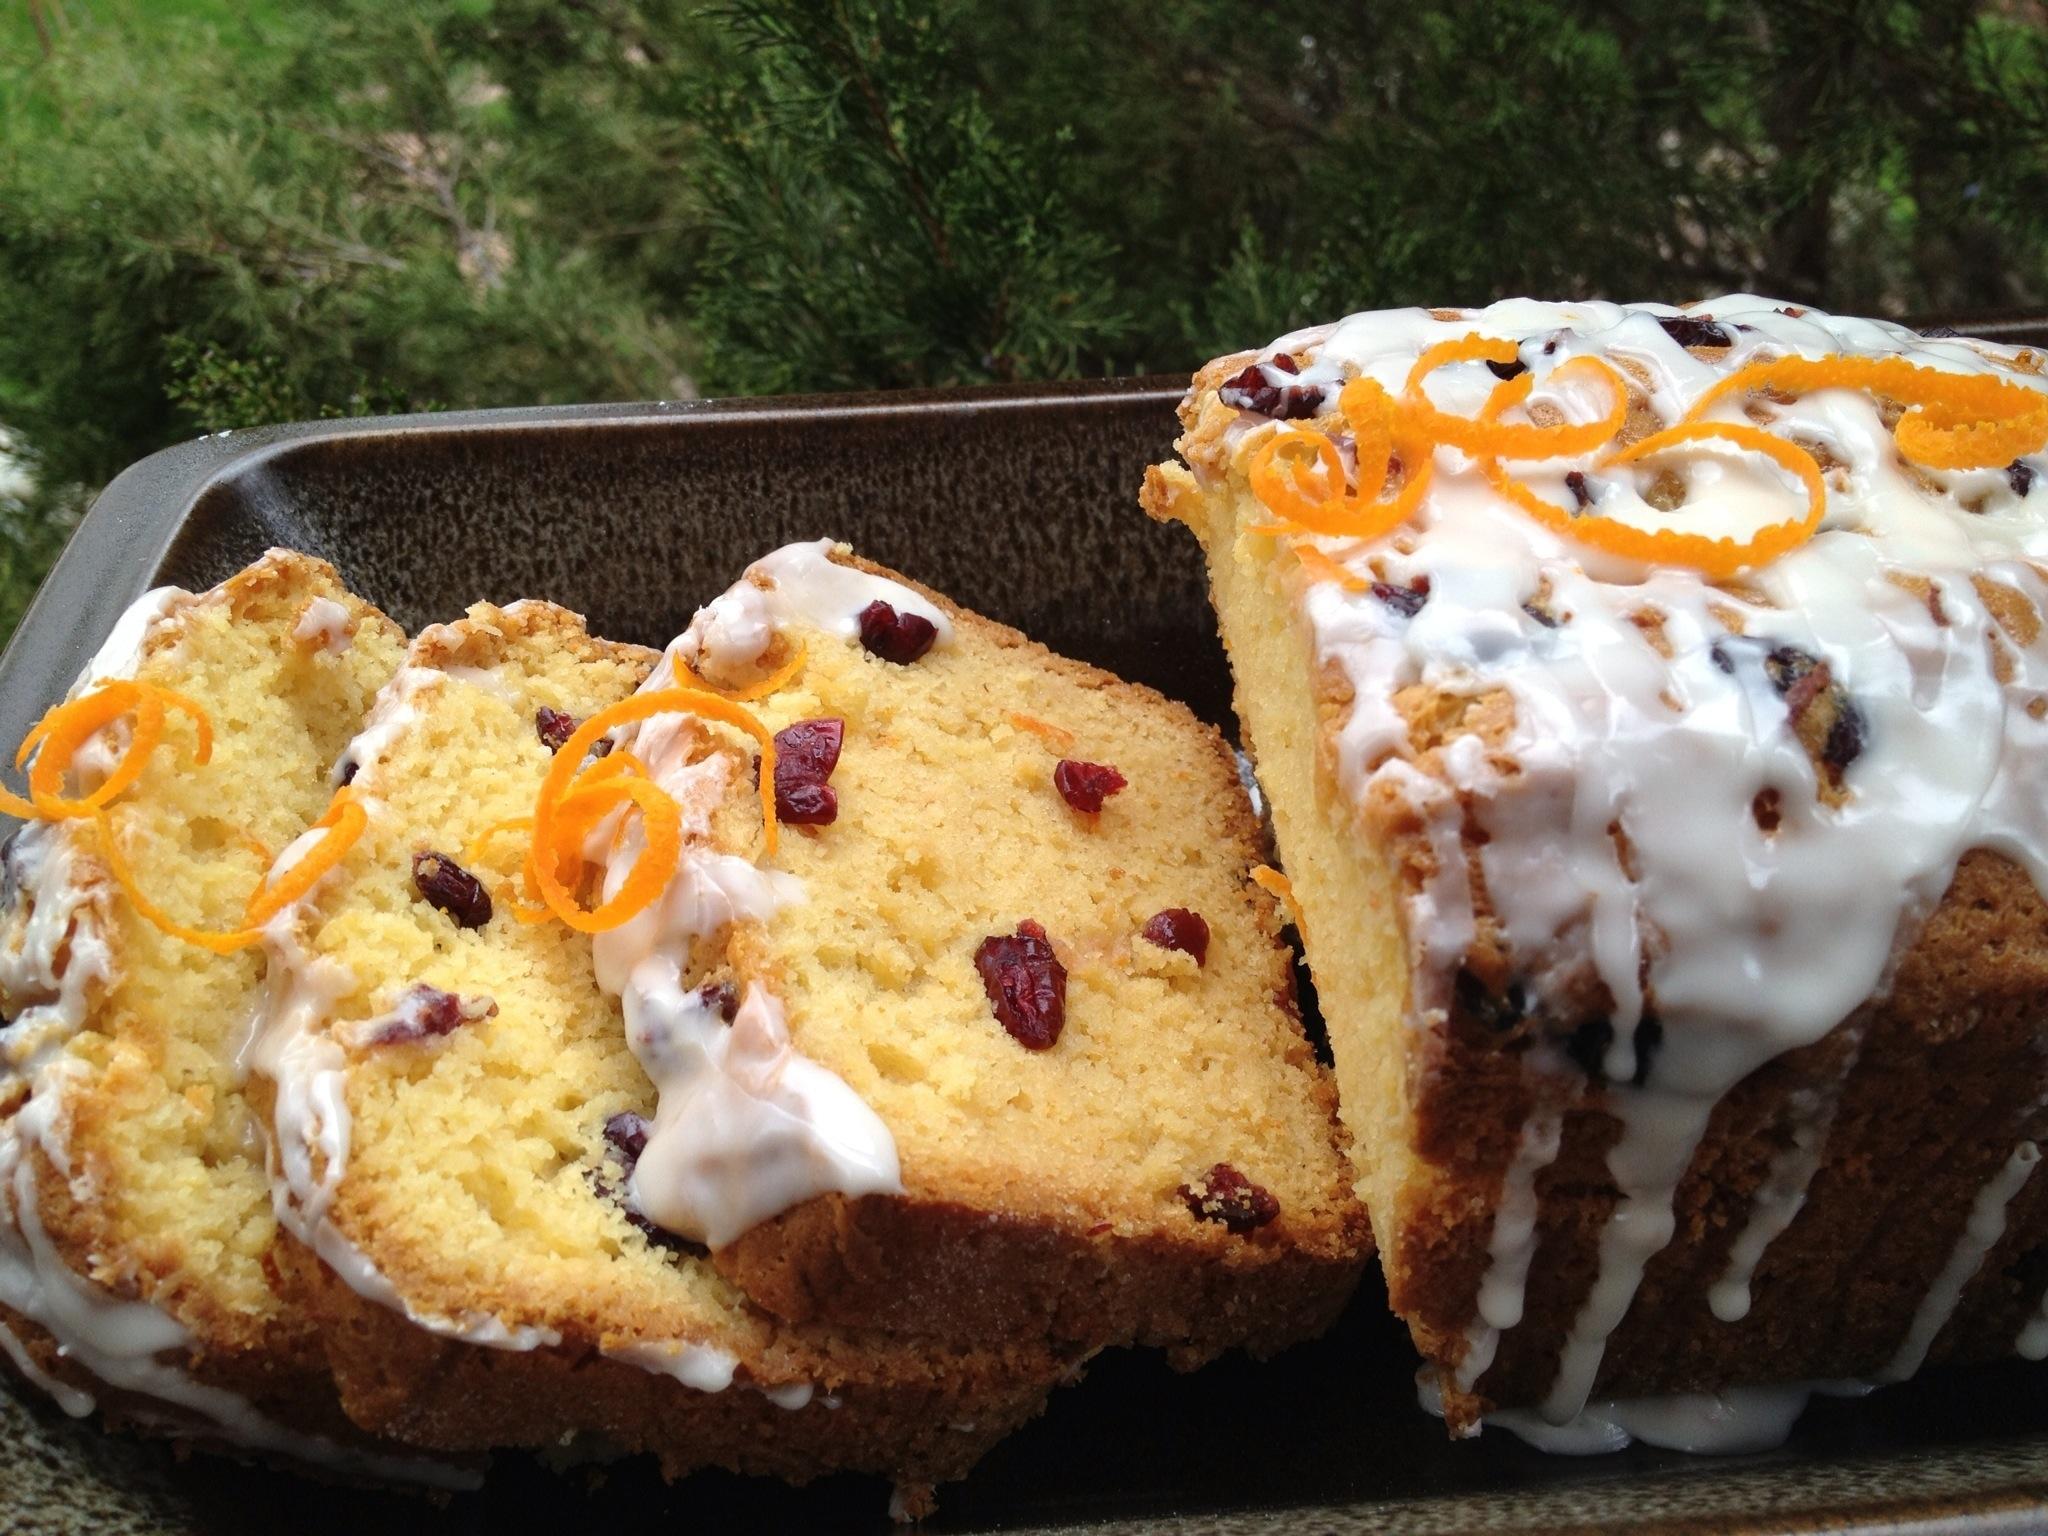 Cranberry Orange Amish Friendship Bread with Southern Comfort Glaze by Paula Altenbach | friendshipbreadkitchen.com